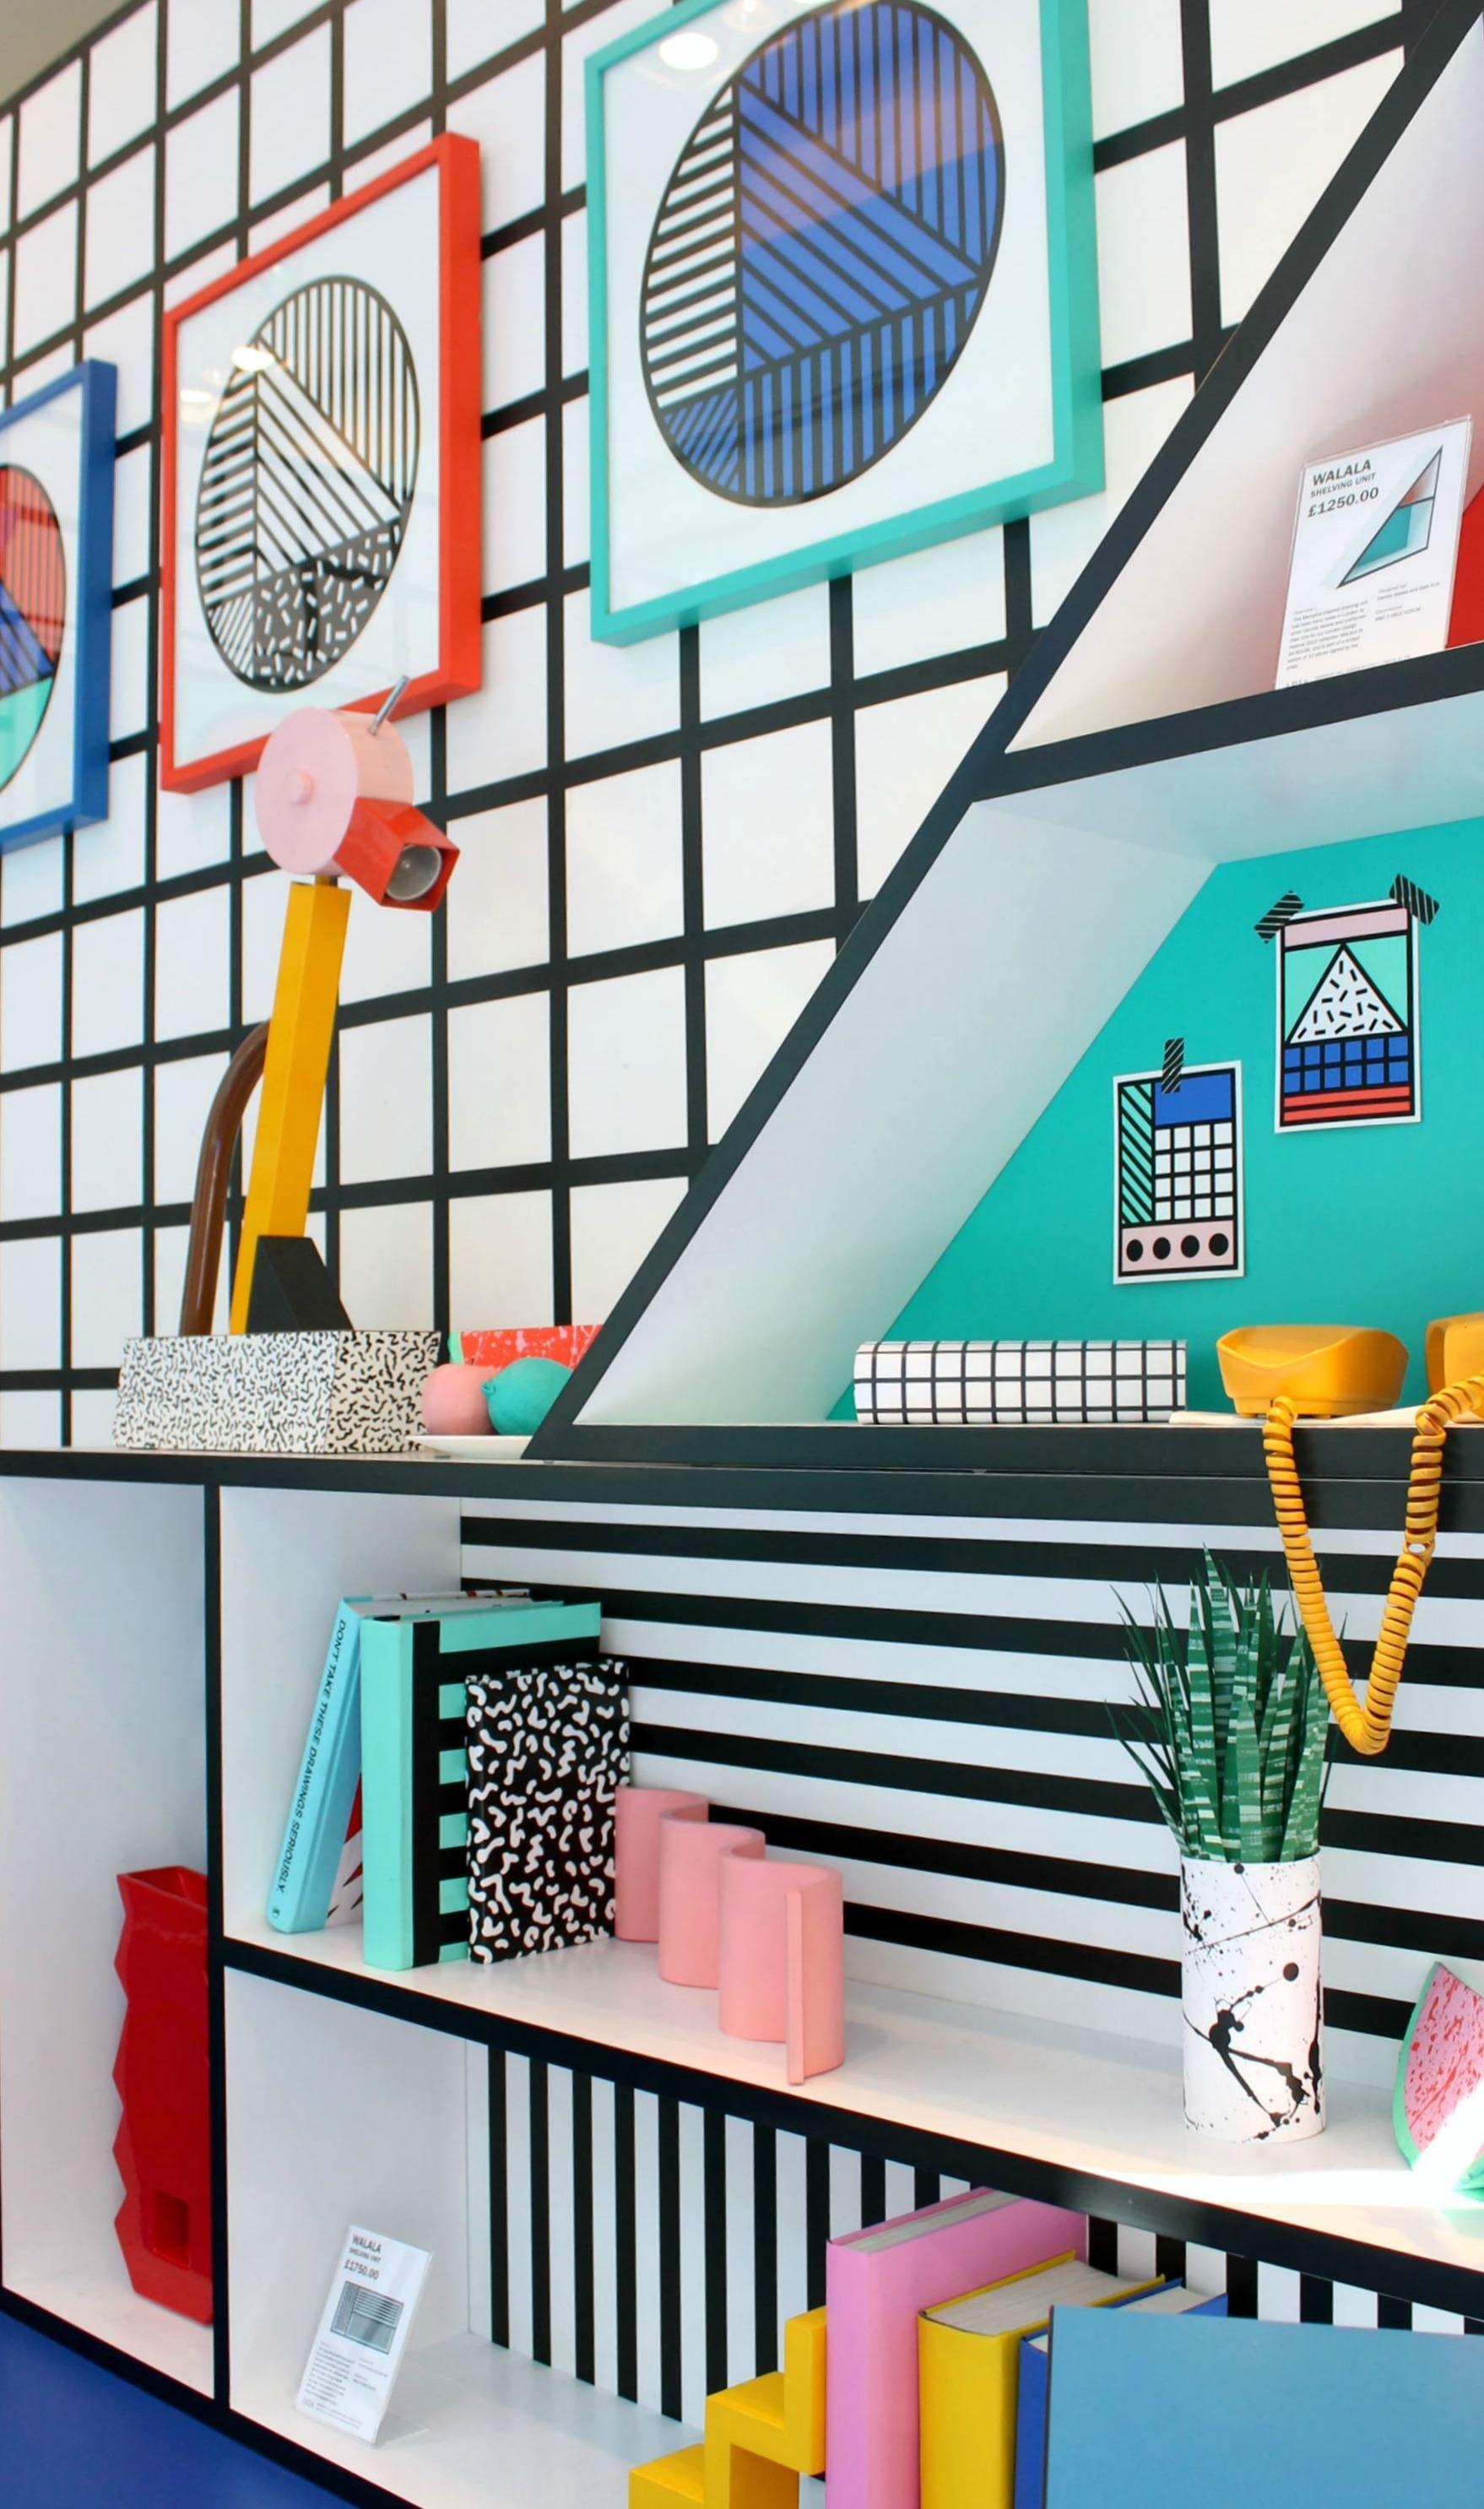 trend alert 1980s memphis design memphis memphis. Black Bedroom Furniture Sets. Home Design Ideas